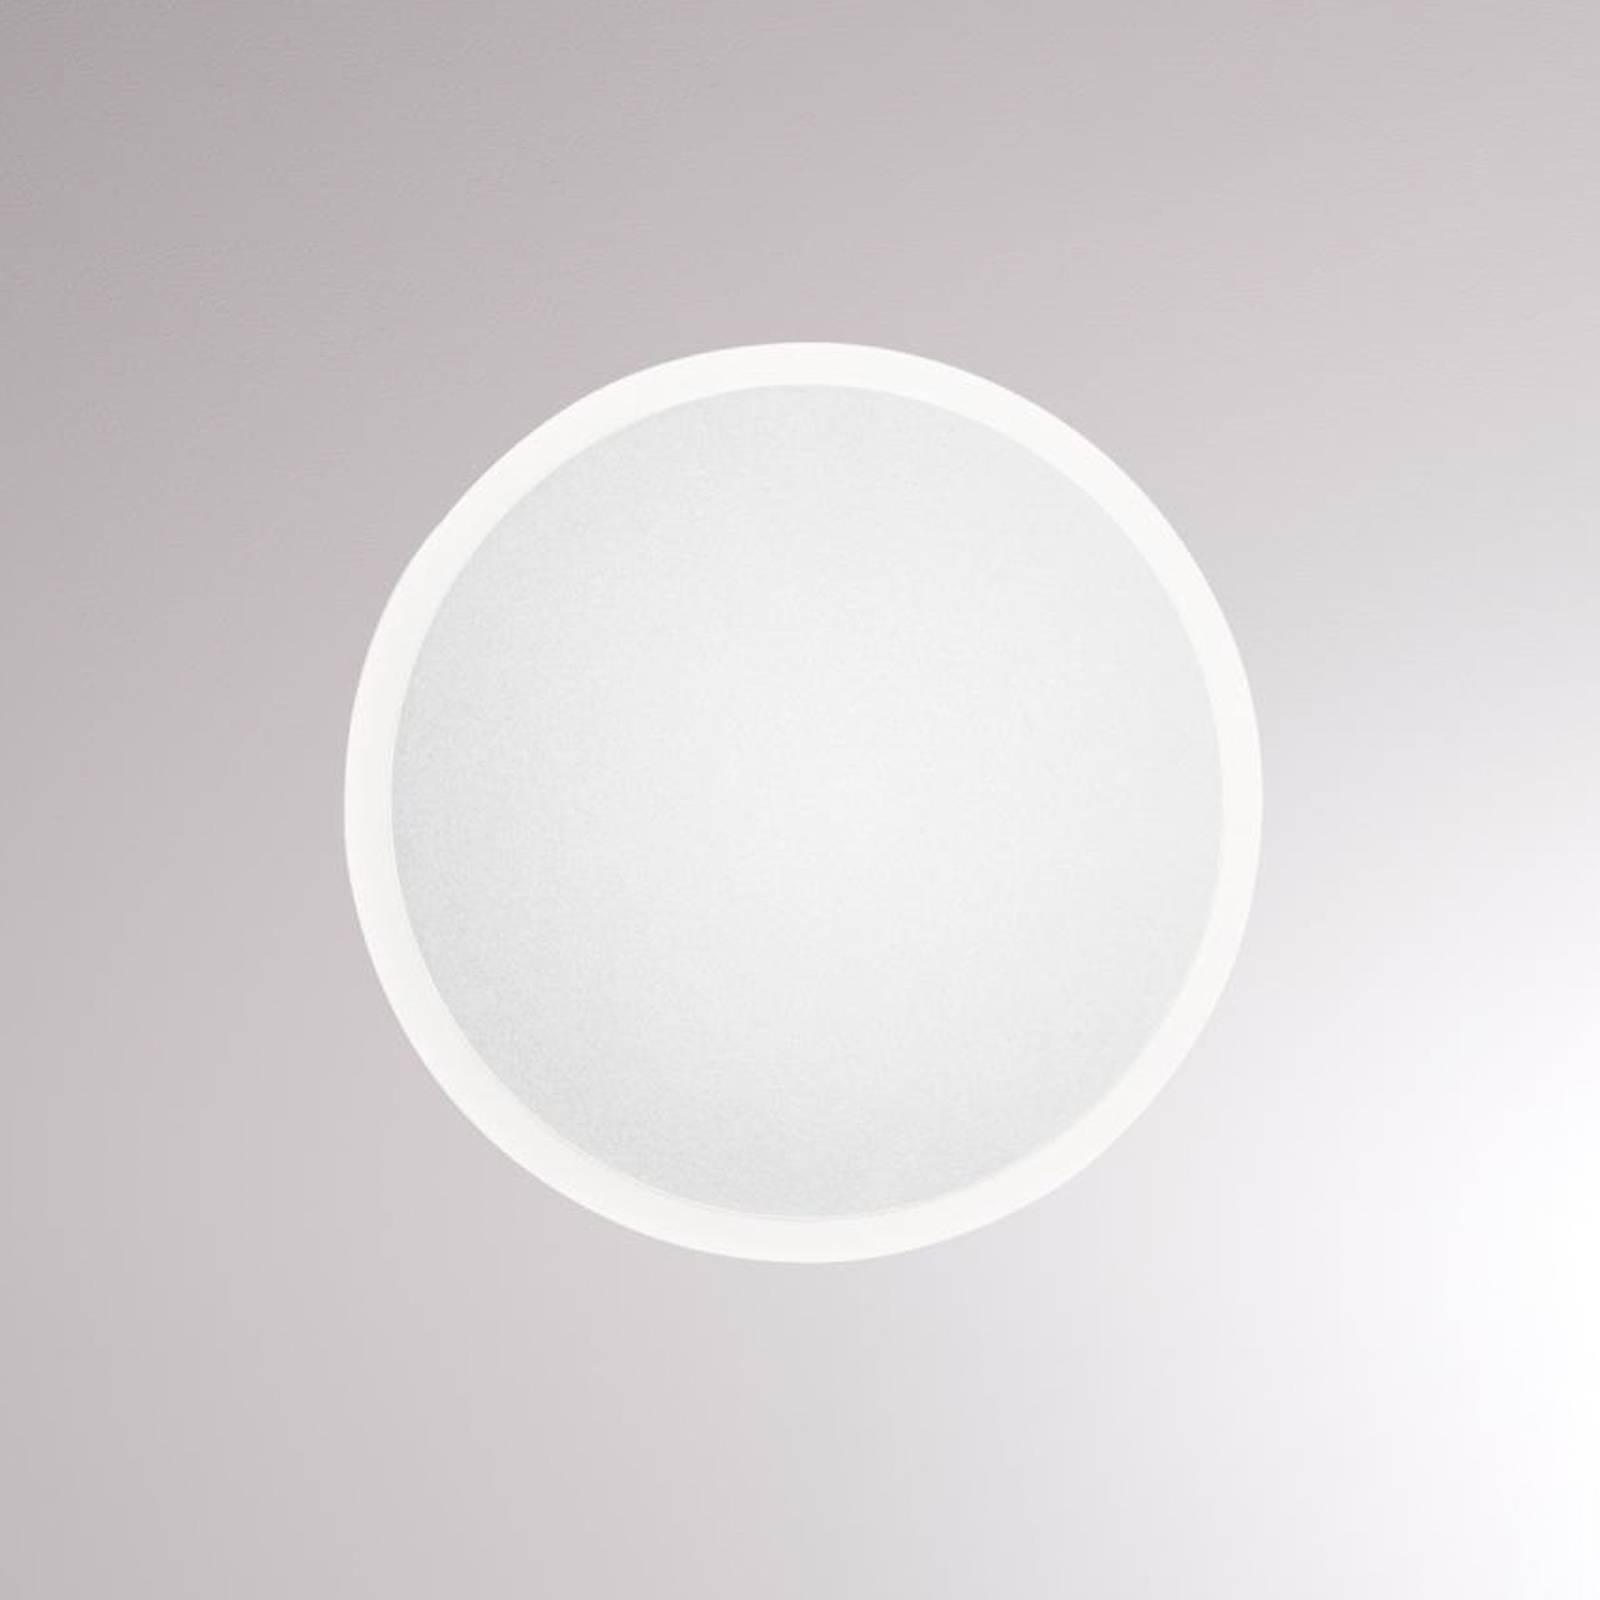 LOUM Pegato LED-Wandleuchte weiß